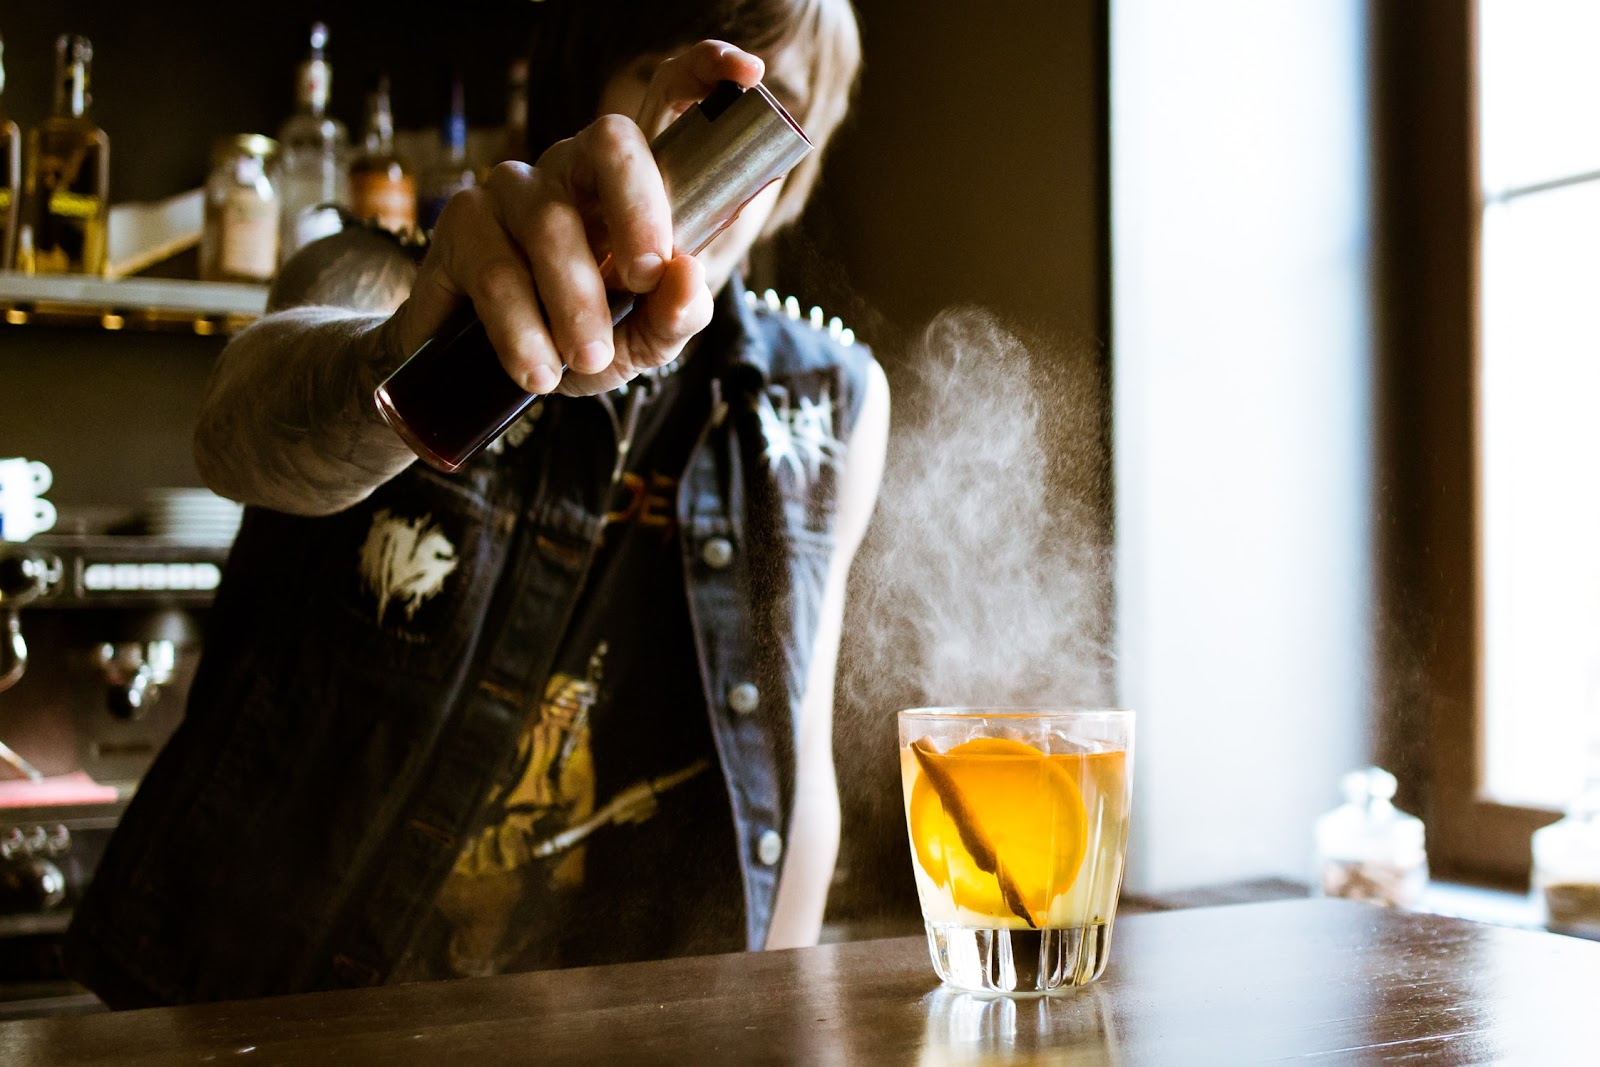 Jobbeschreibung eines Barkeepers